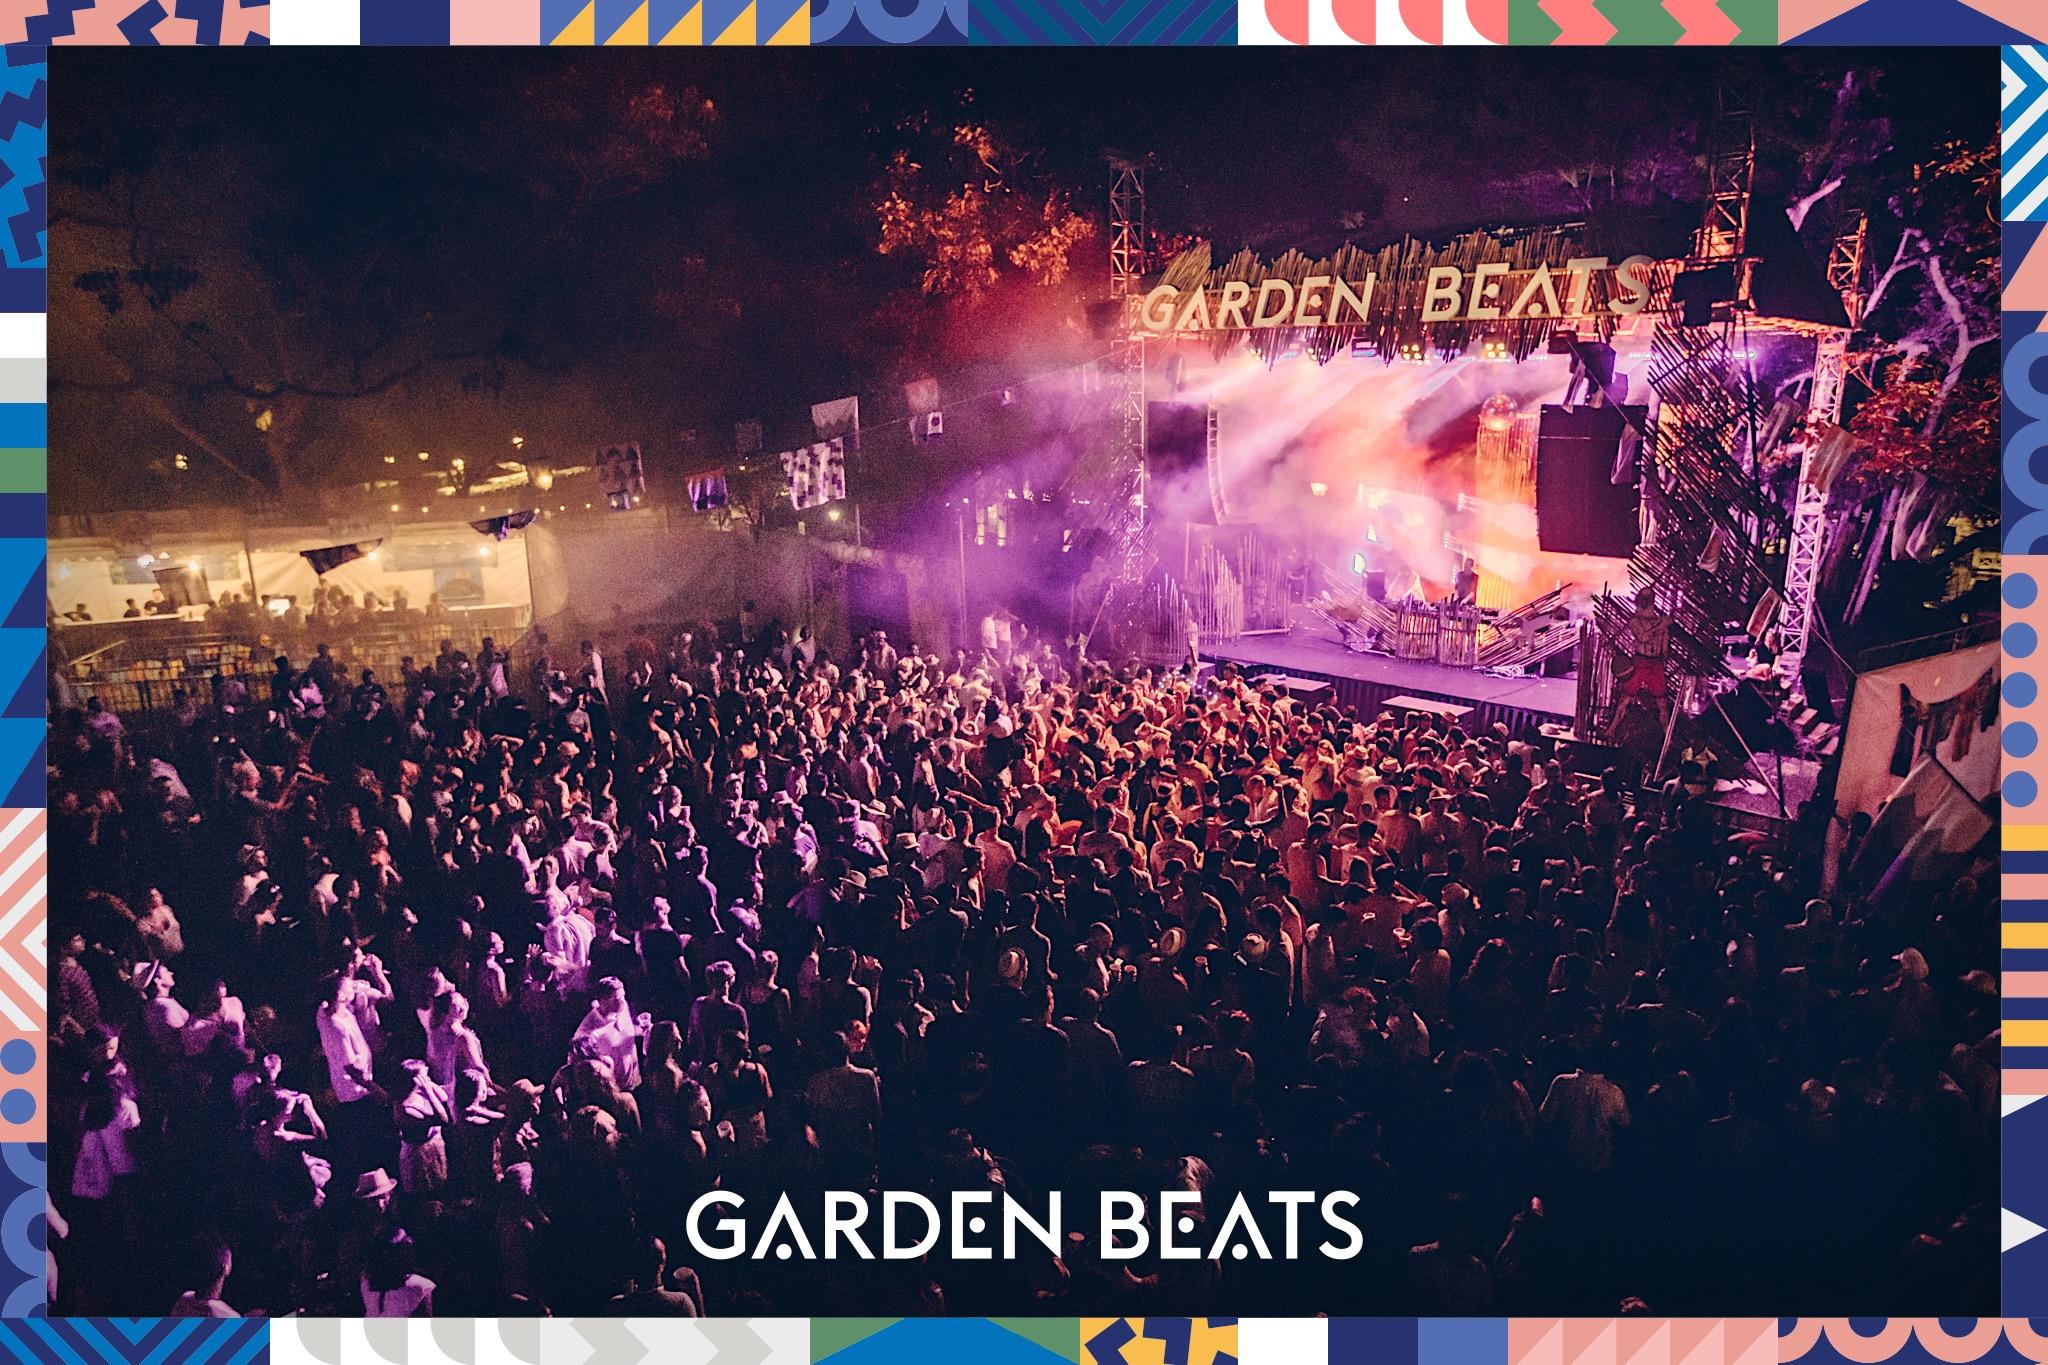 18032017_GardenBeats_Colossal887_WatermarkedGB.jpg